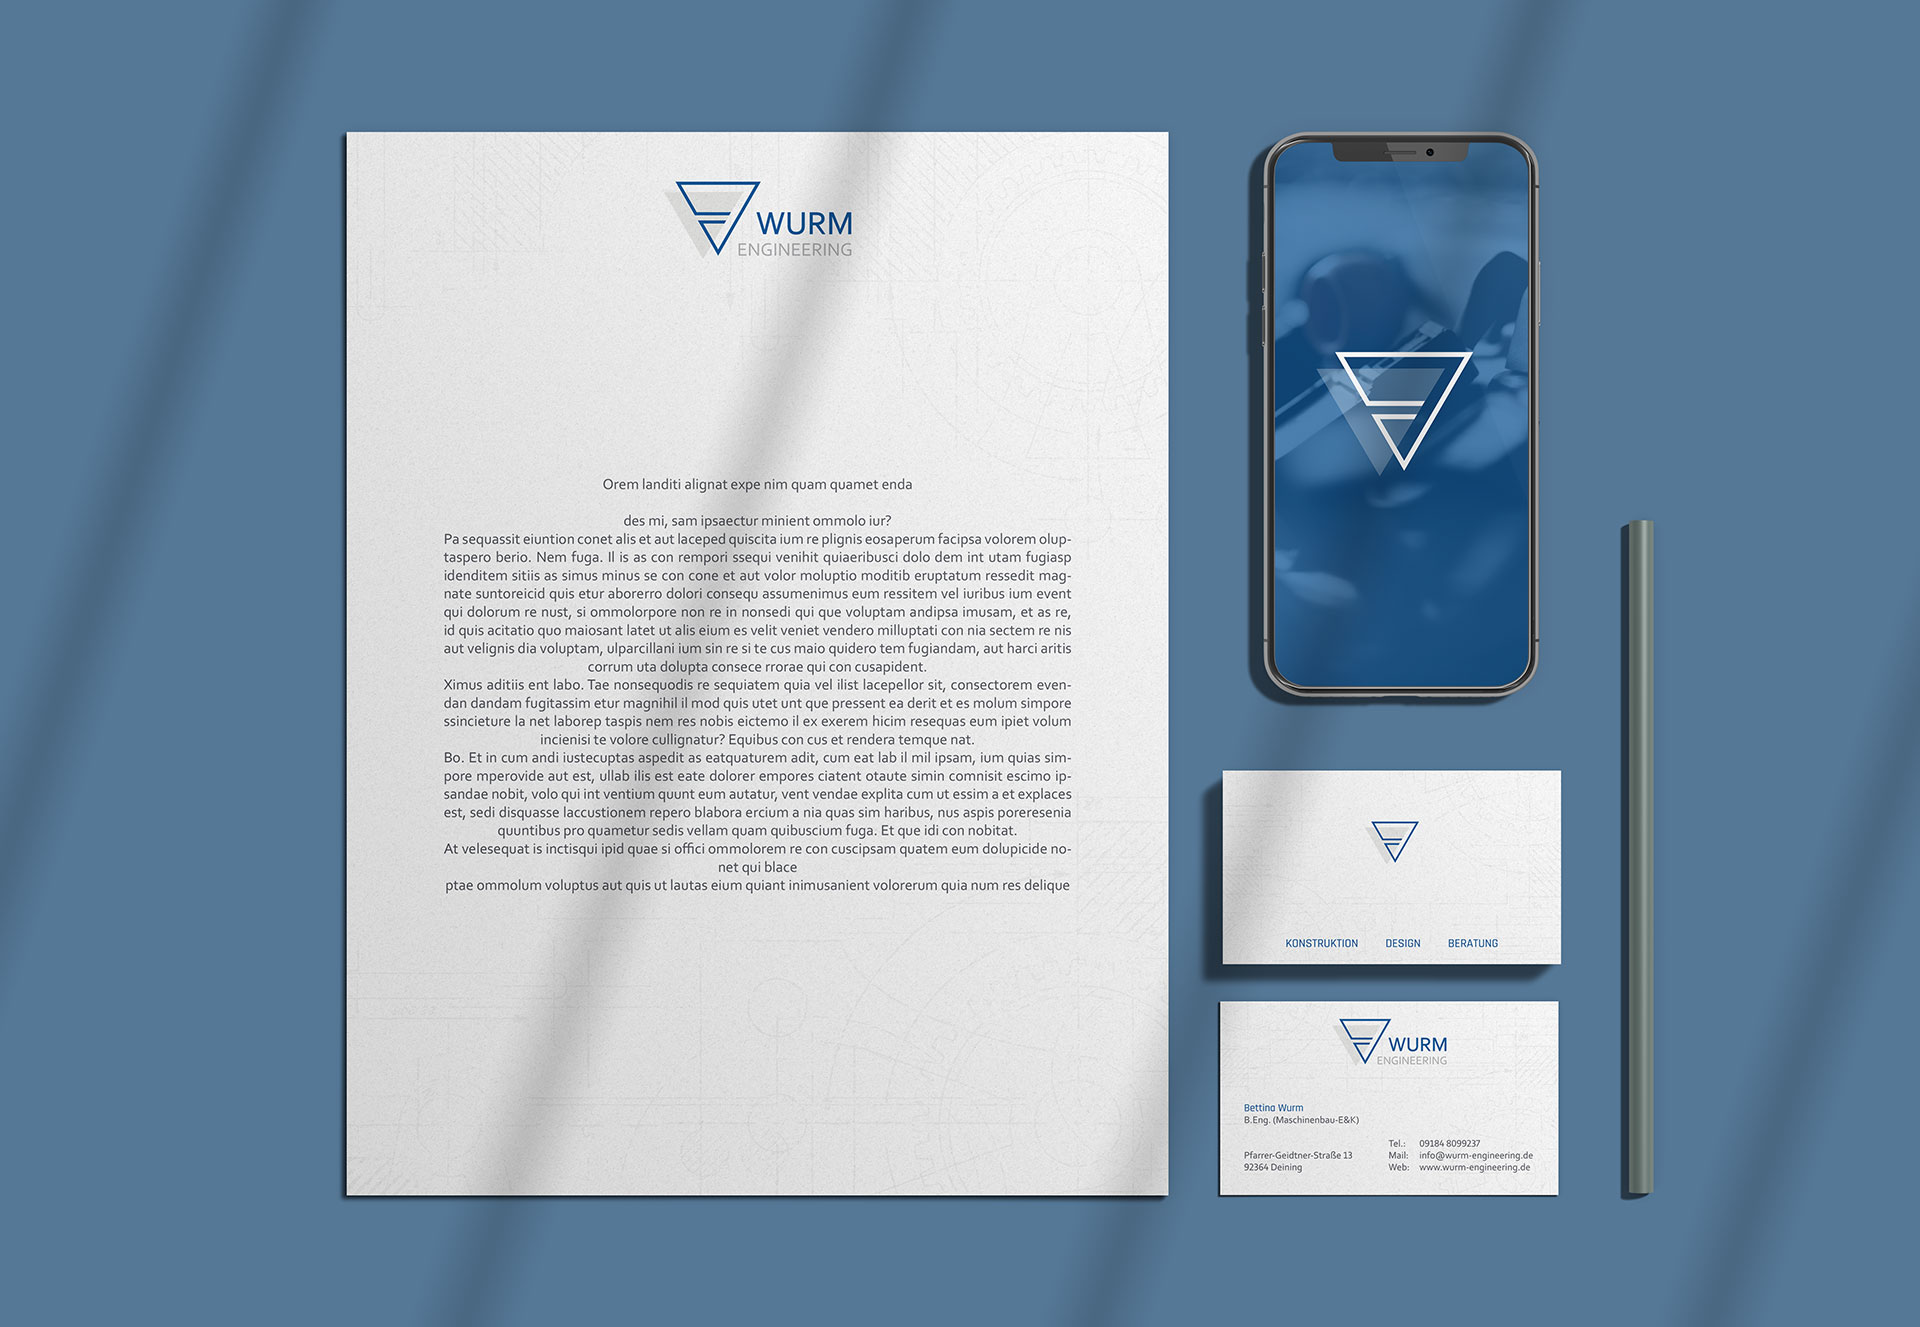 Wurm Engineering Corporate Design